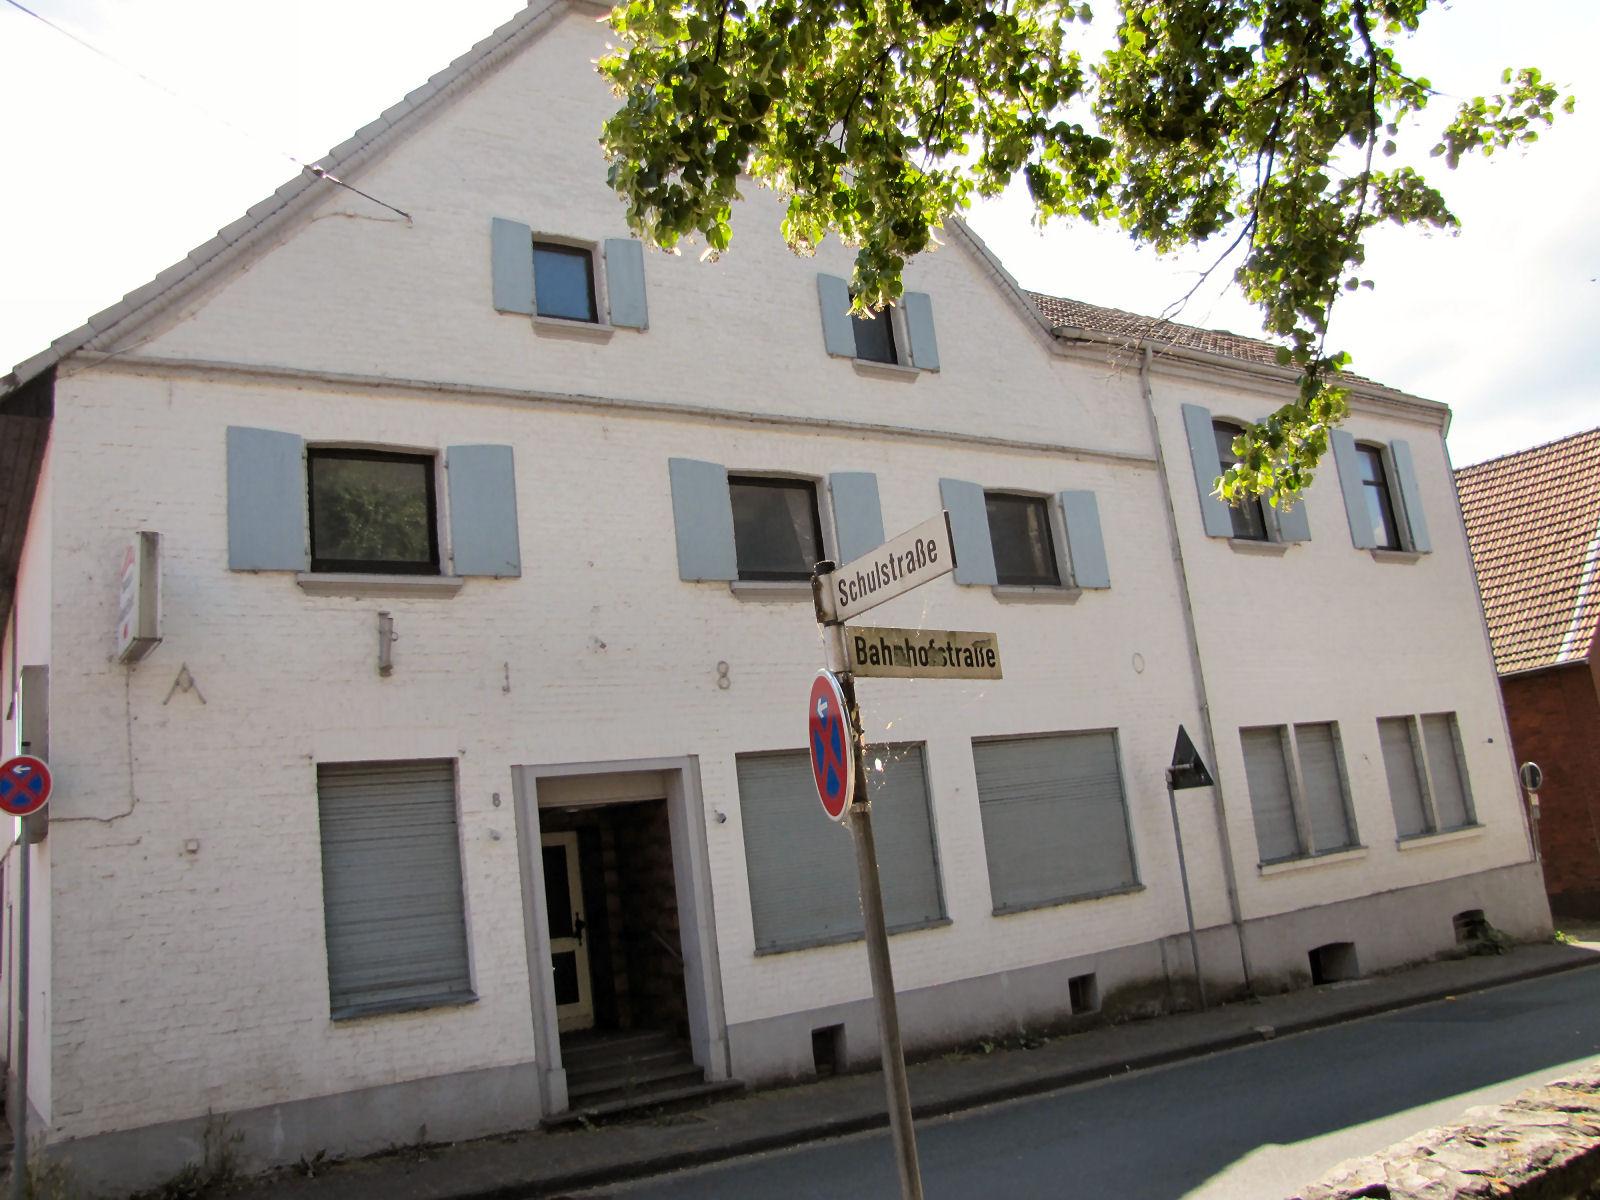 Brauhaus Lembeck, Hotel, Restaurant, Gasthof Sprenger